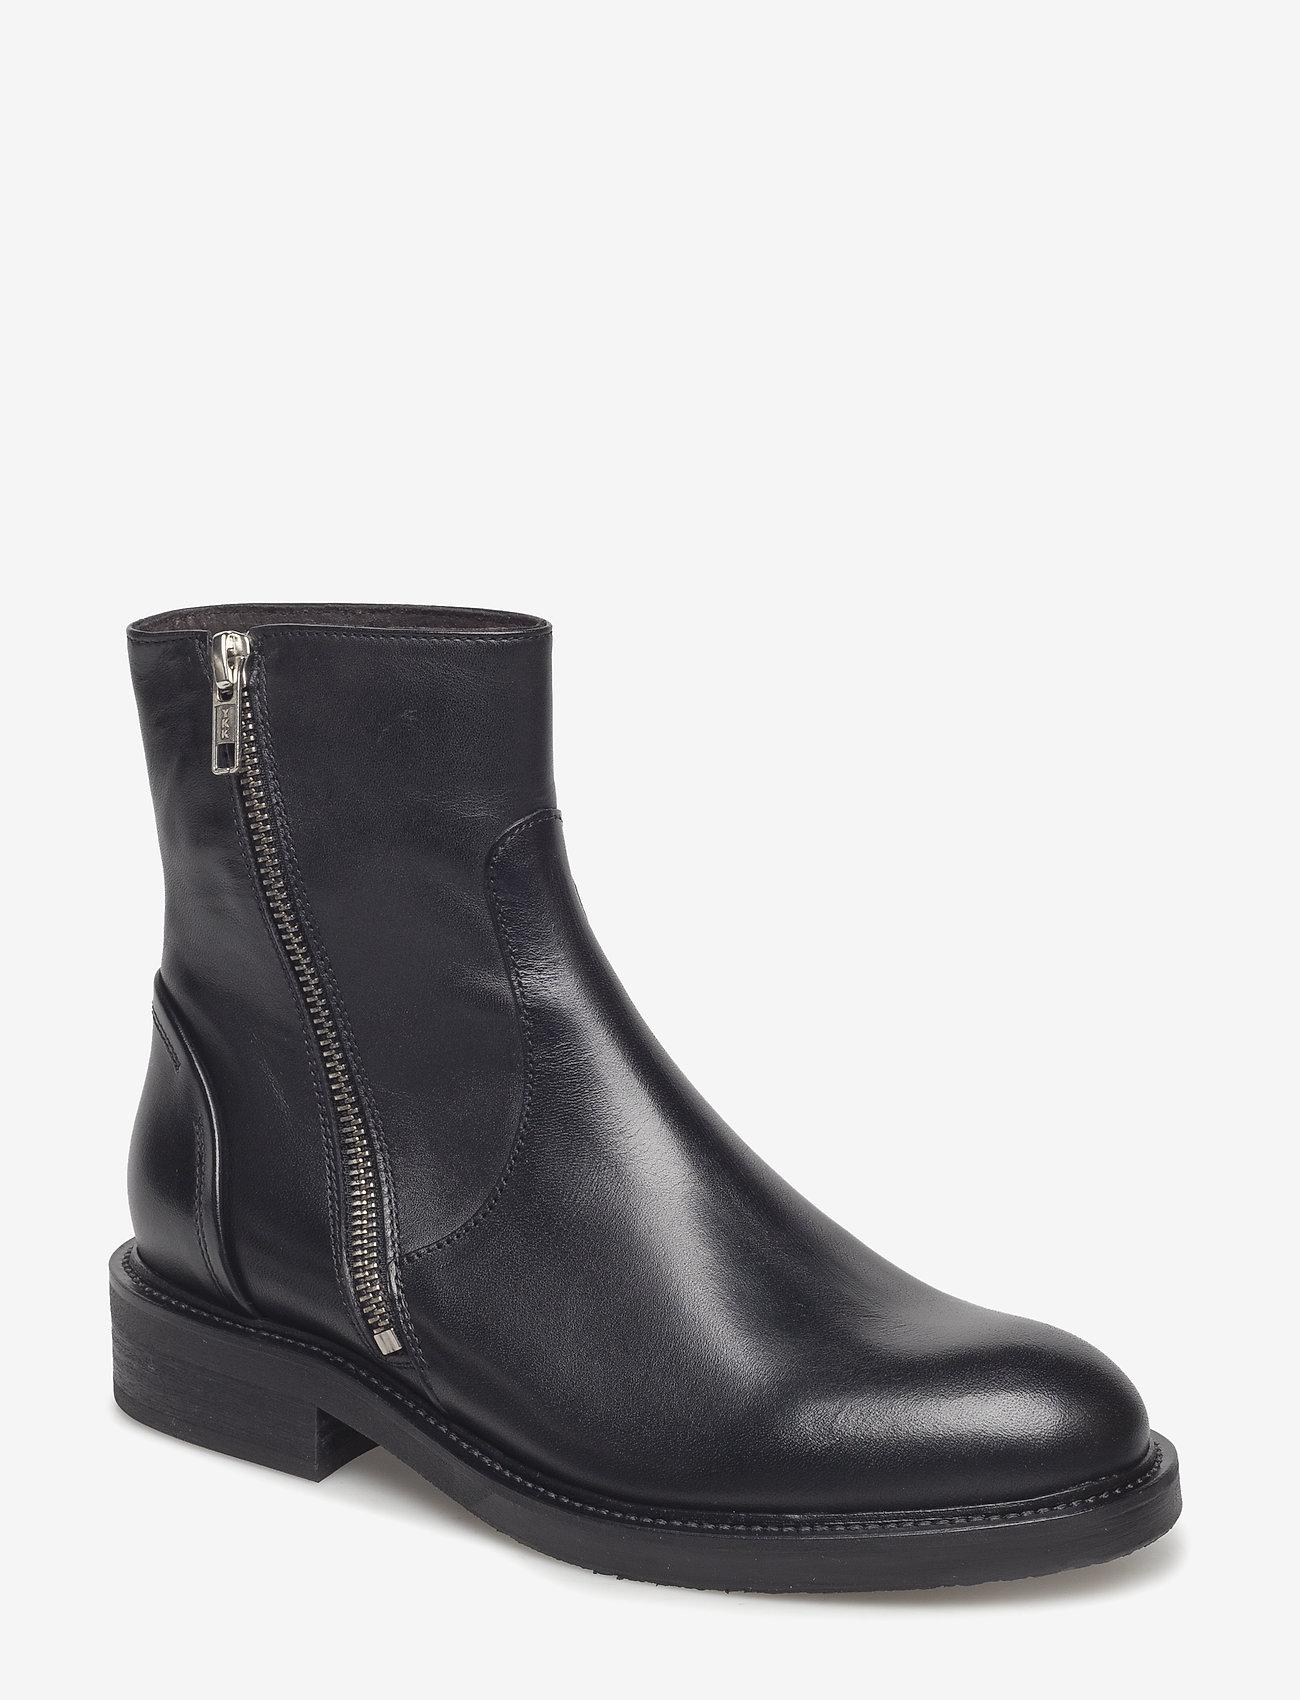 Billi Bi - Boots 813102 - platte enkellaarsjes - black calf 80 - 0